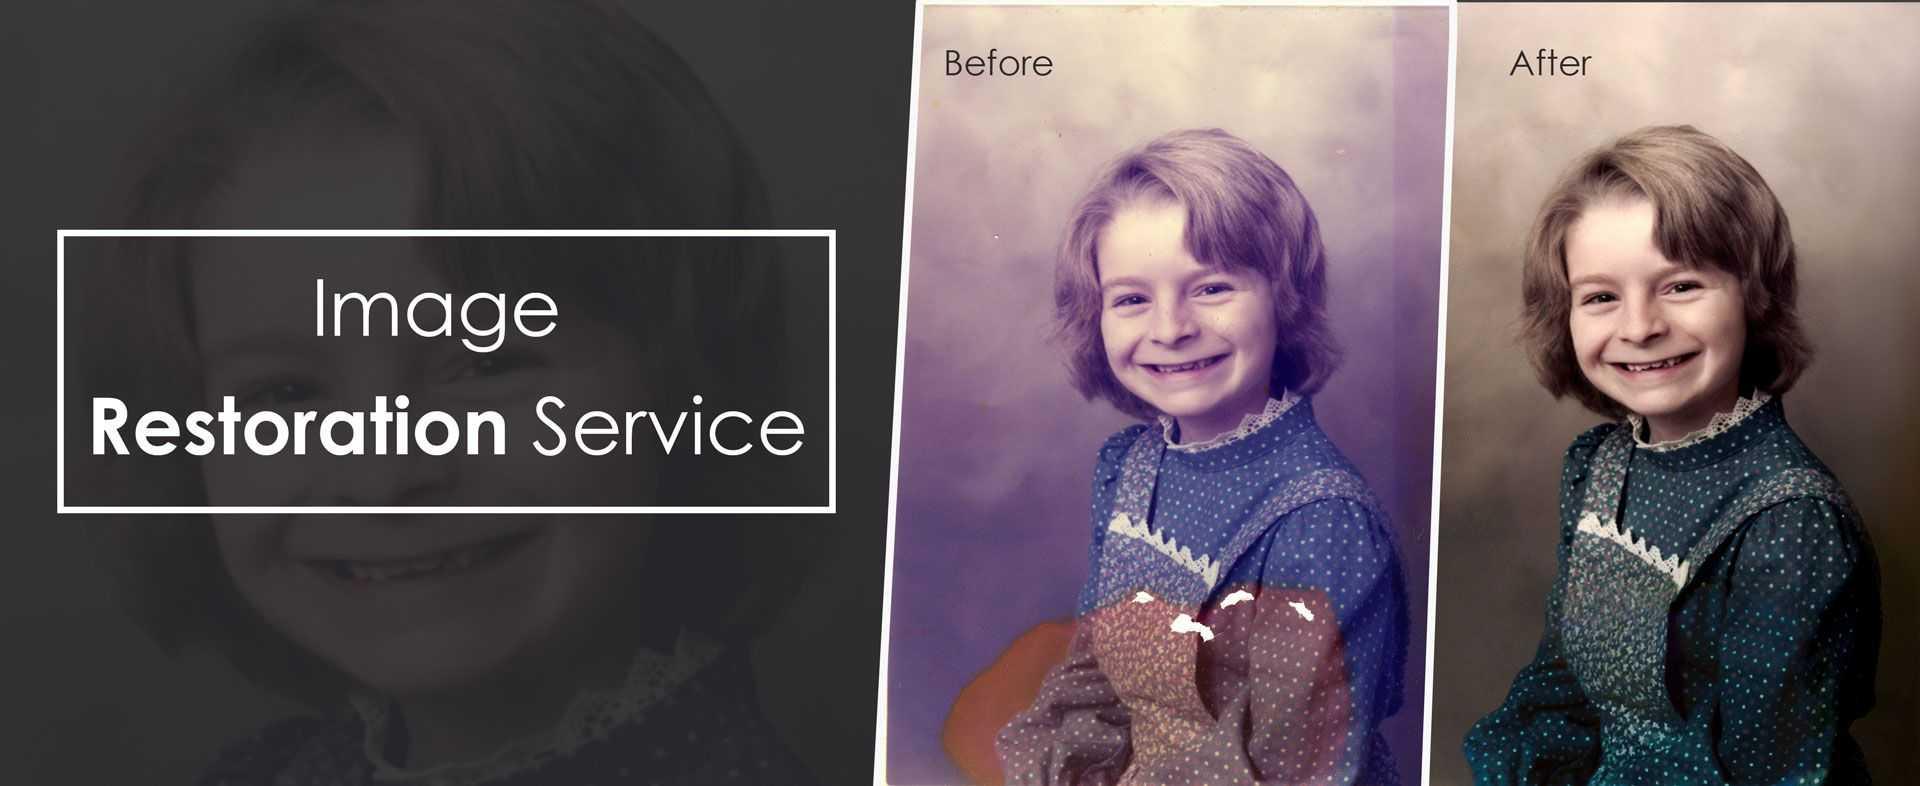 Image-Restoration-Service